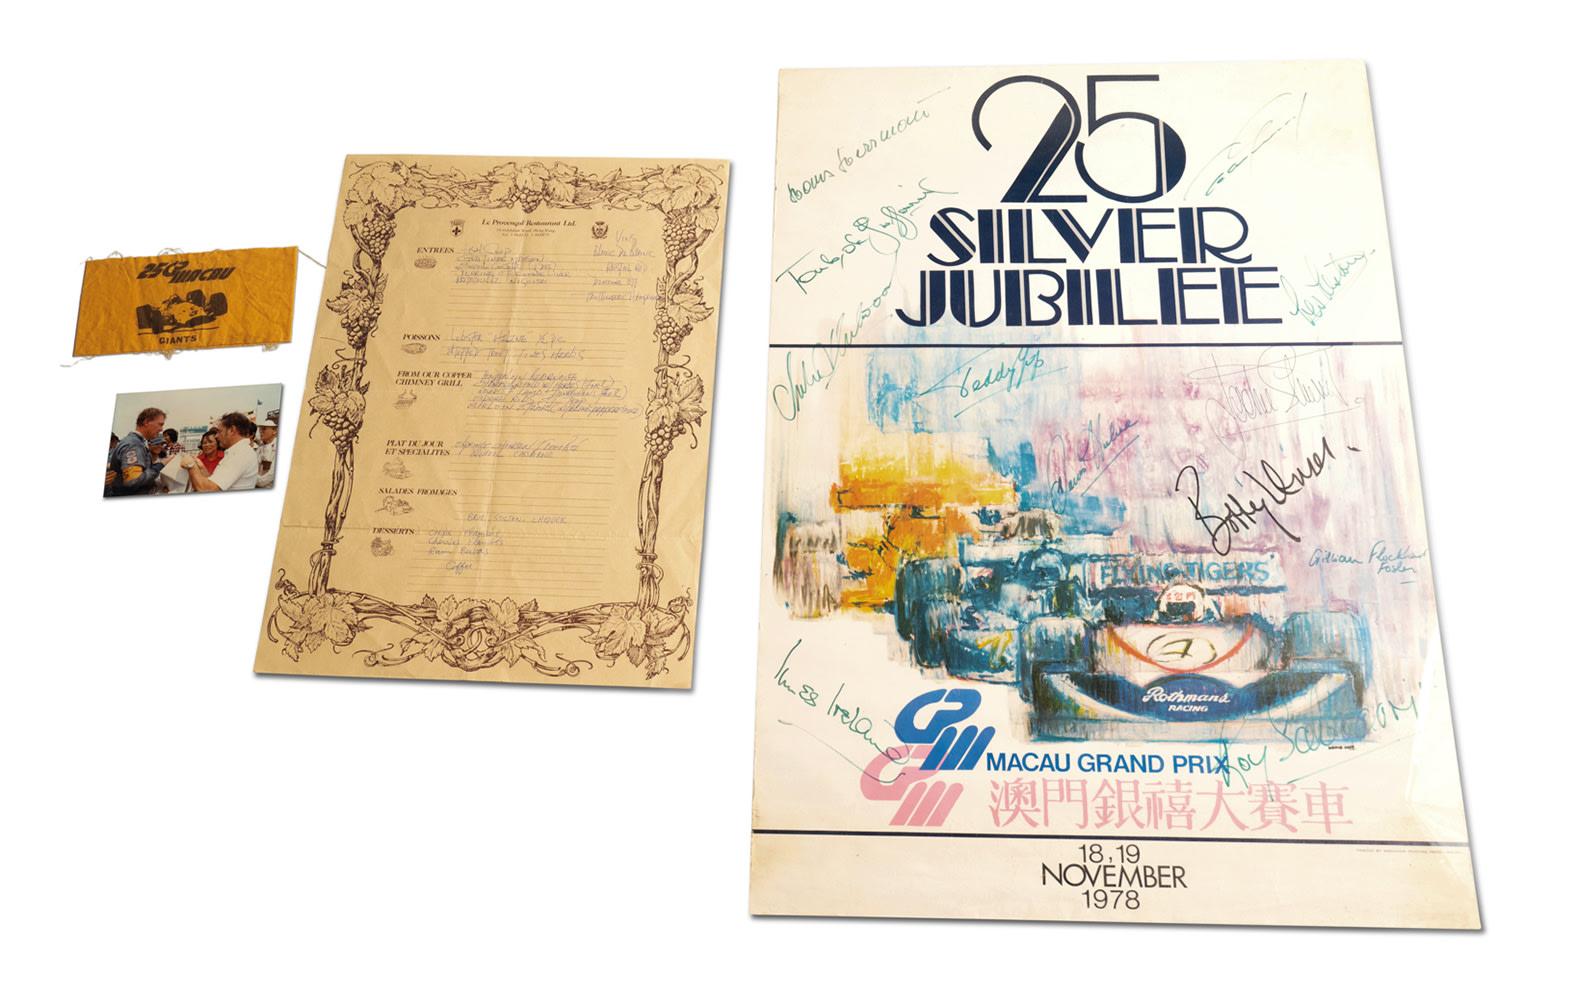 1978 Macau Grand Prix Signed Poster and Armband